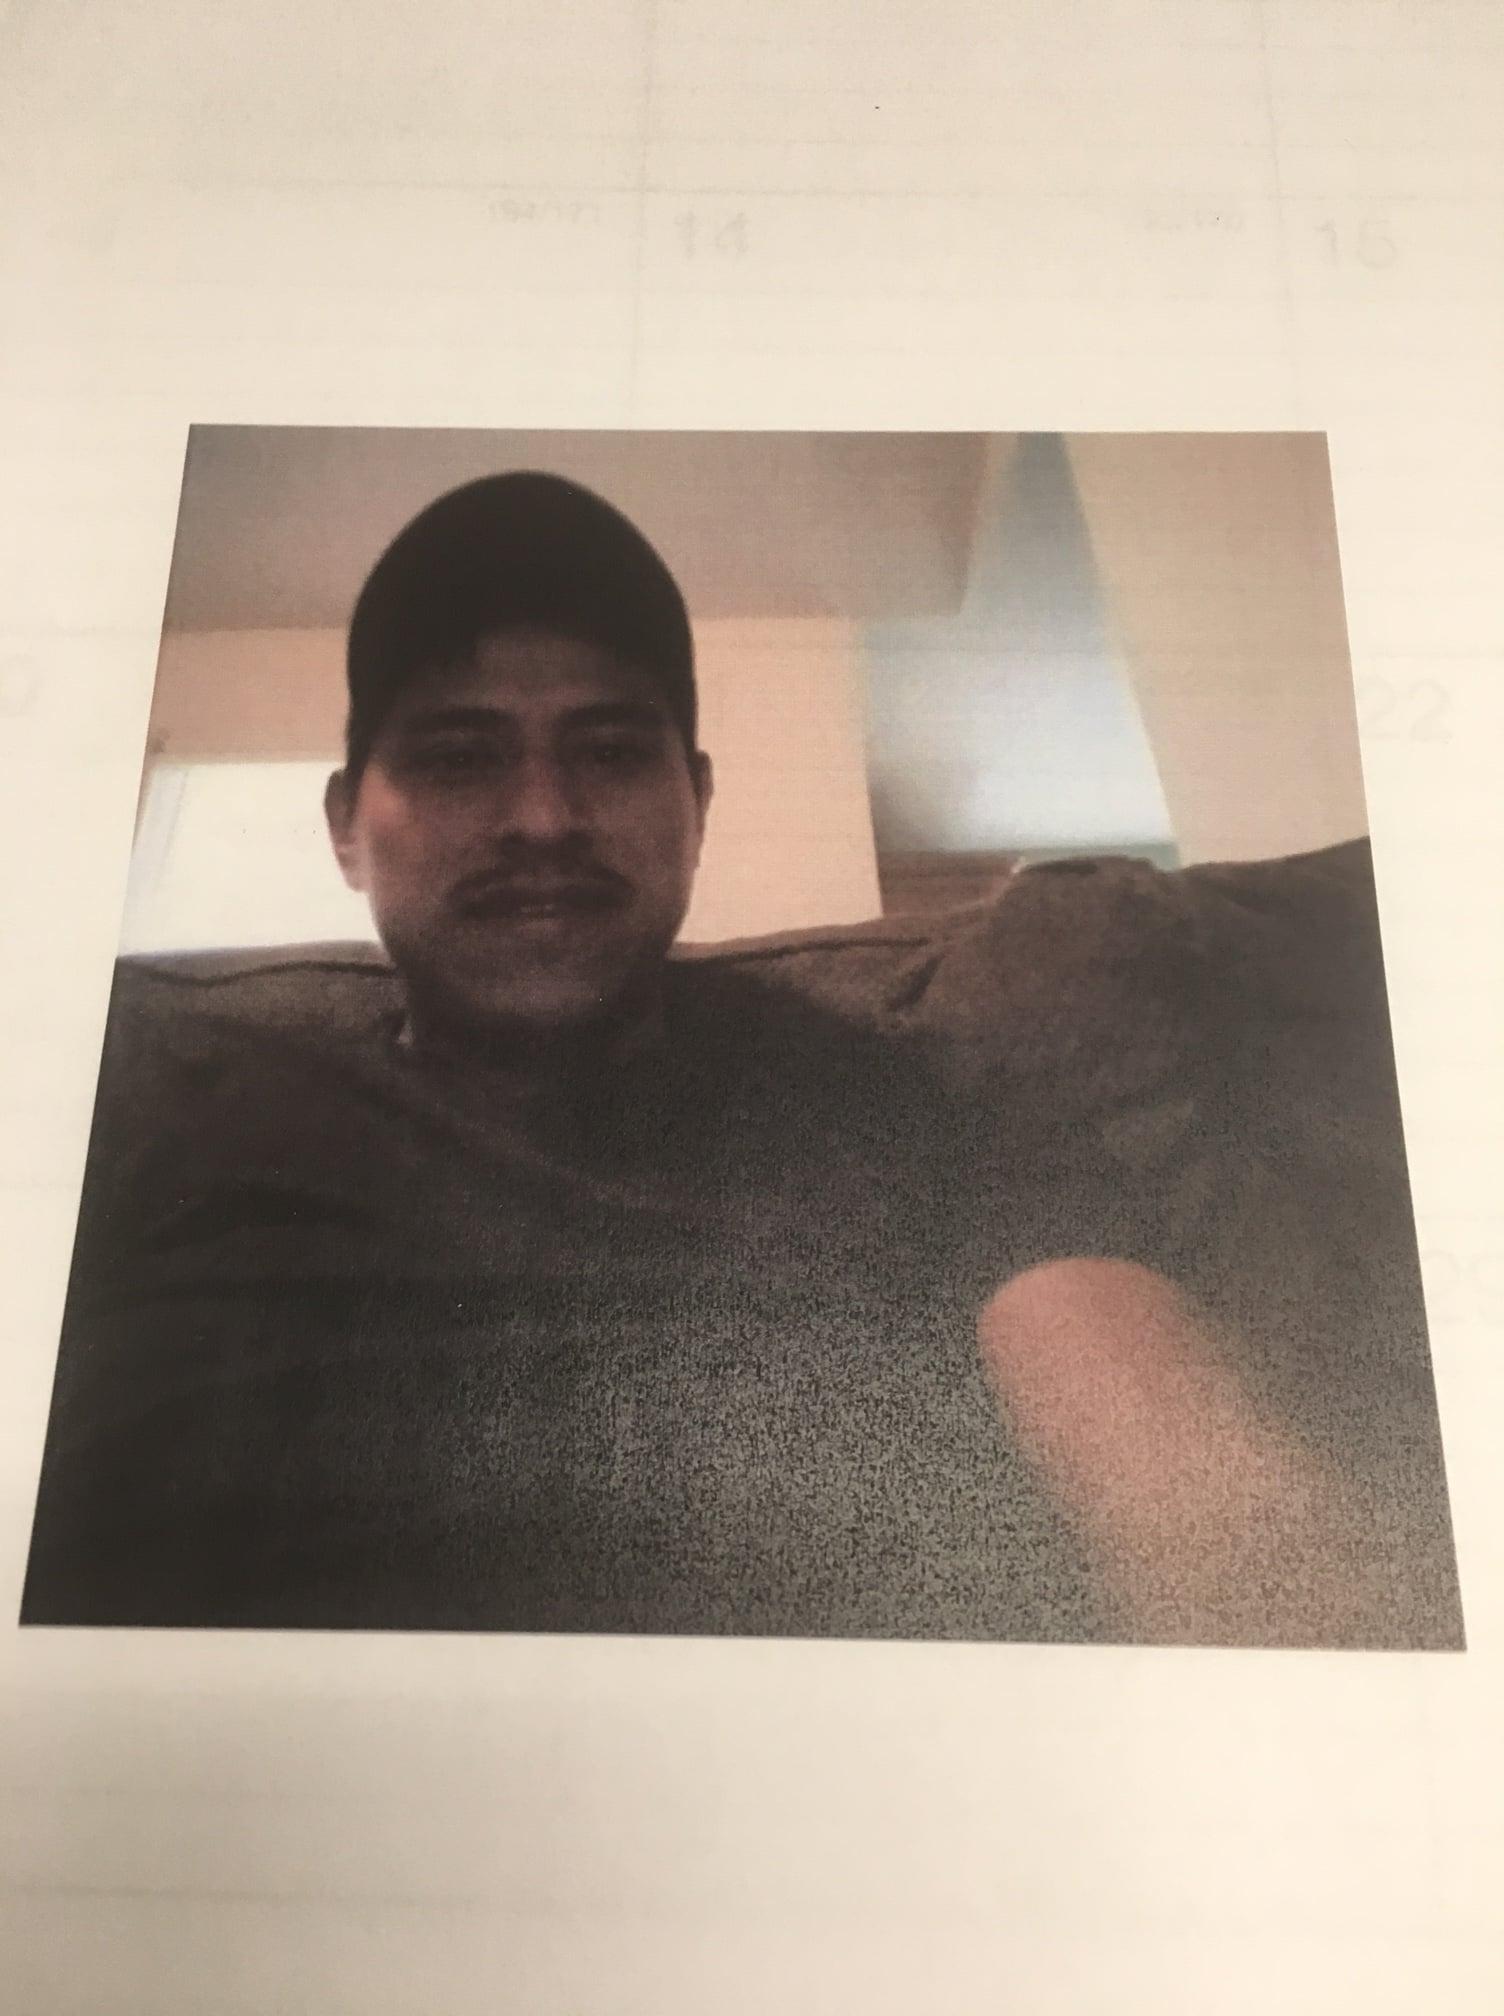 APD Seeks Public's Help In locating Missing Man